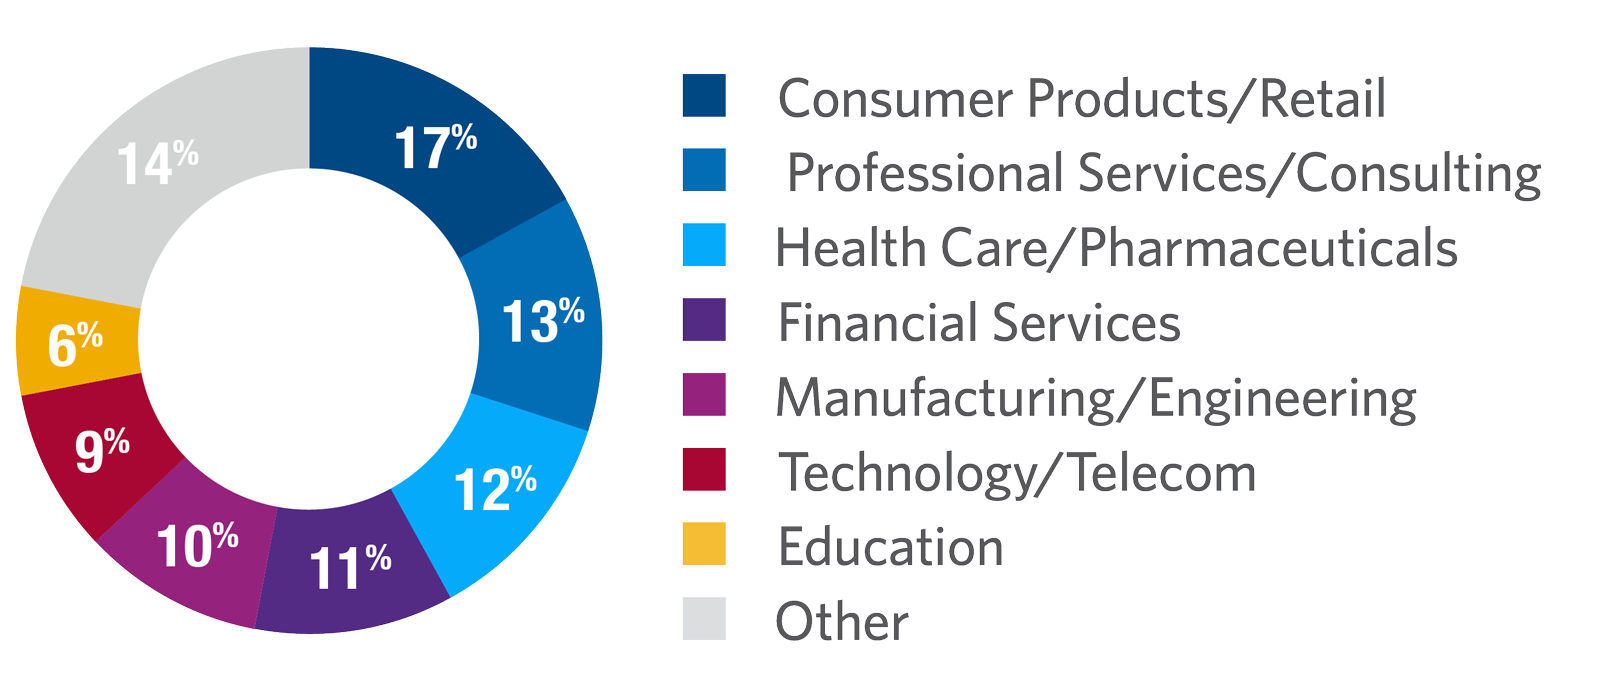 Digital Marketing Strategies for the Digital Economy by Industry